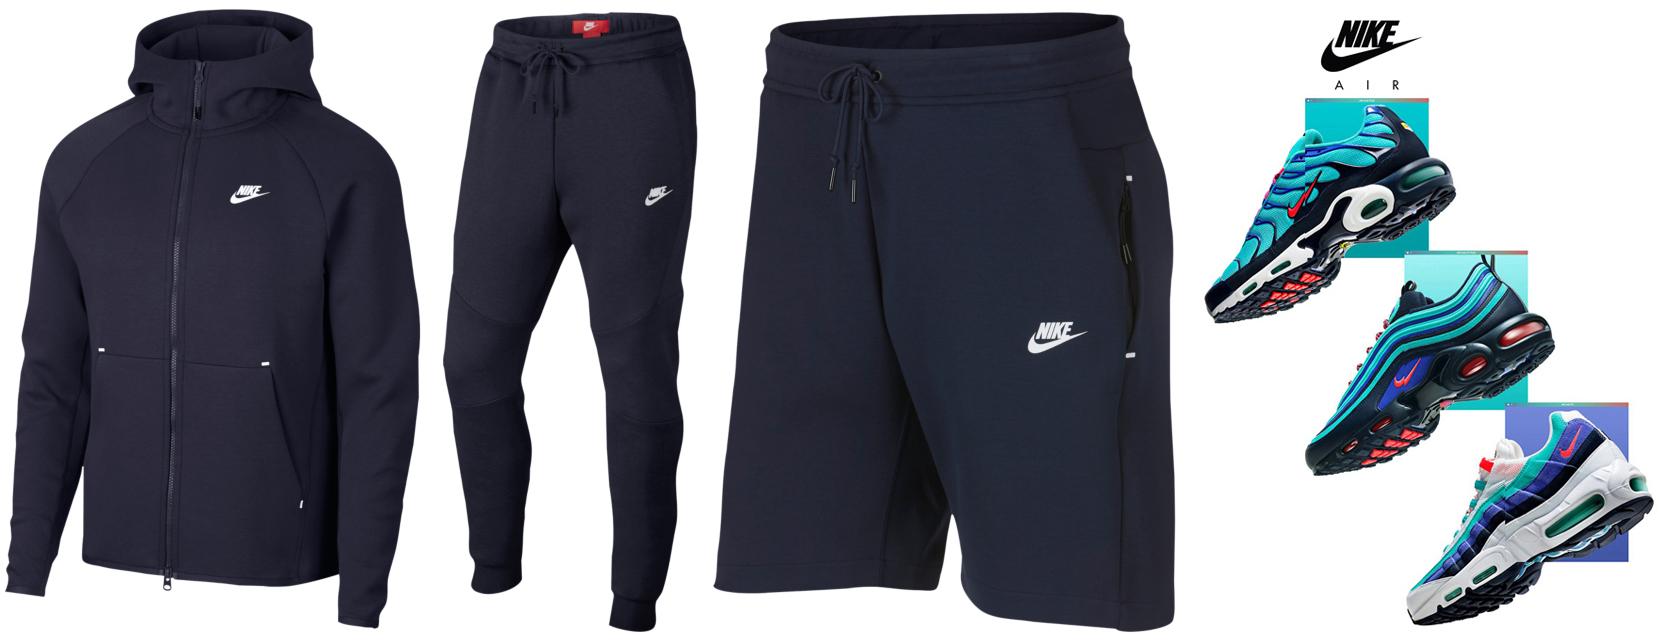 nike-air-max-origins-tech-fleece-clothing-match